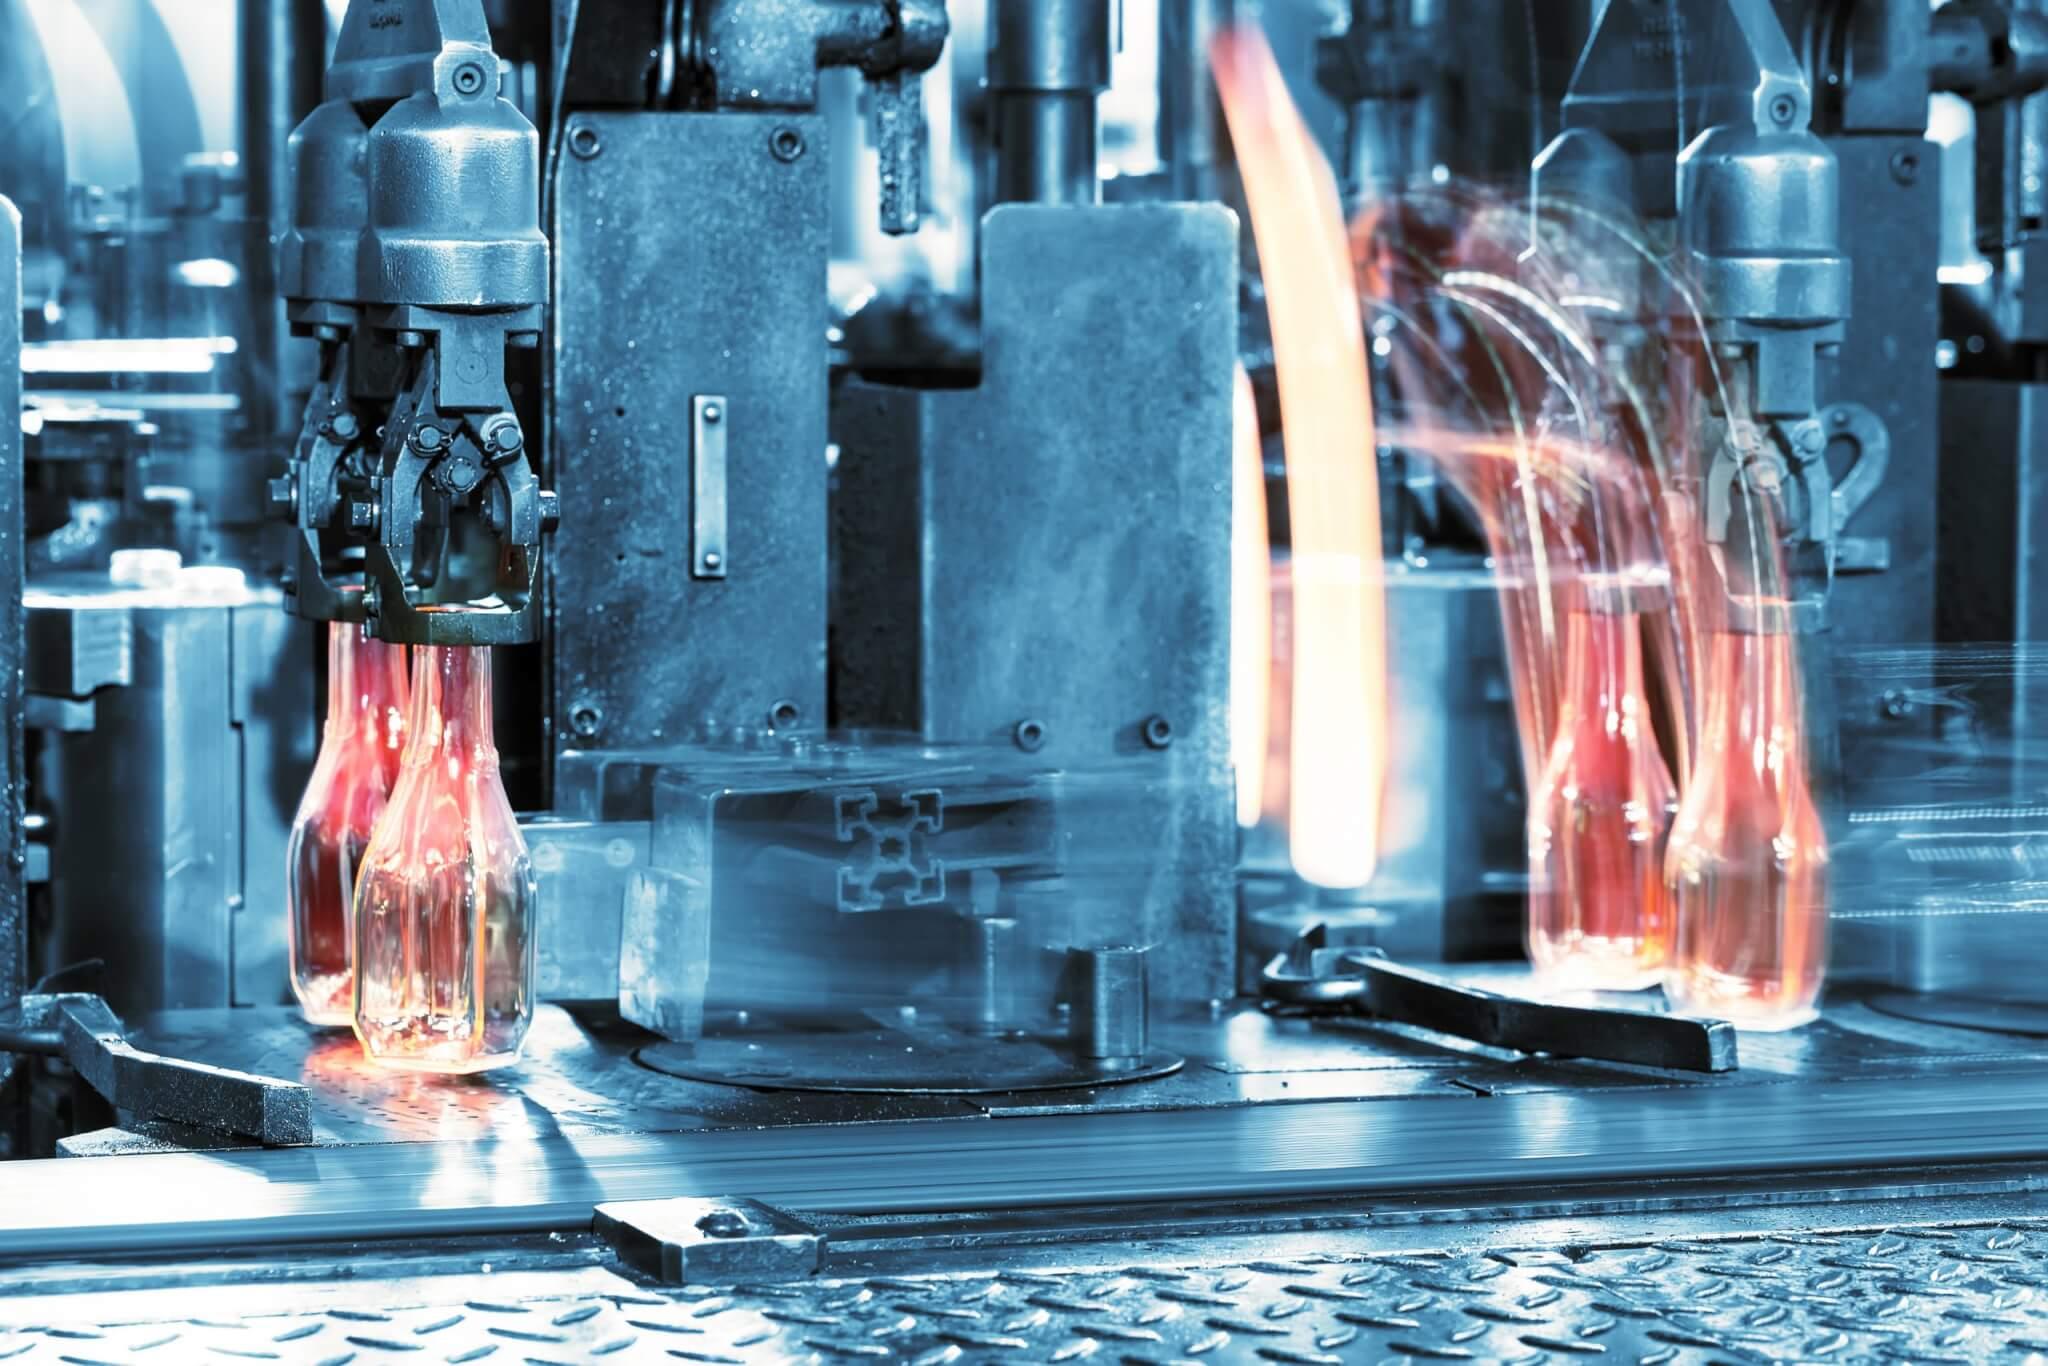 aandelen saint gobain glas fabriek